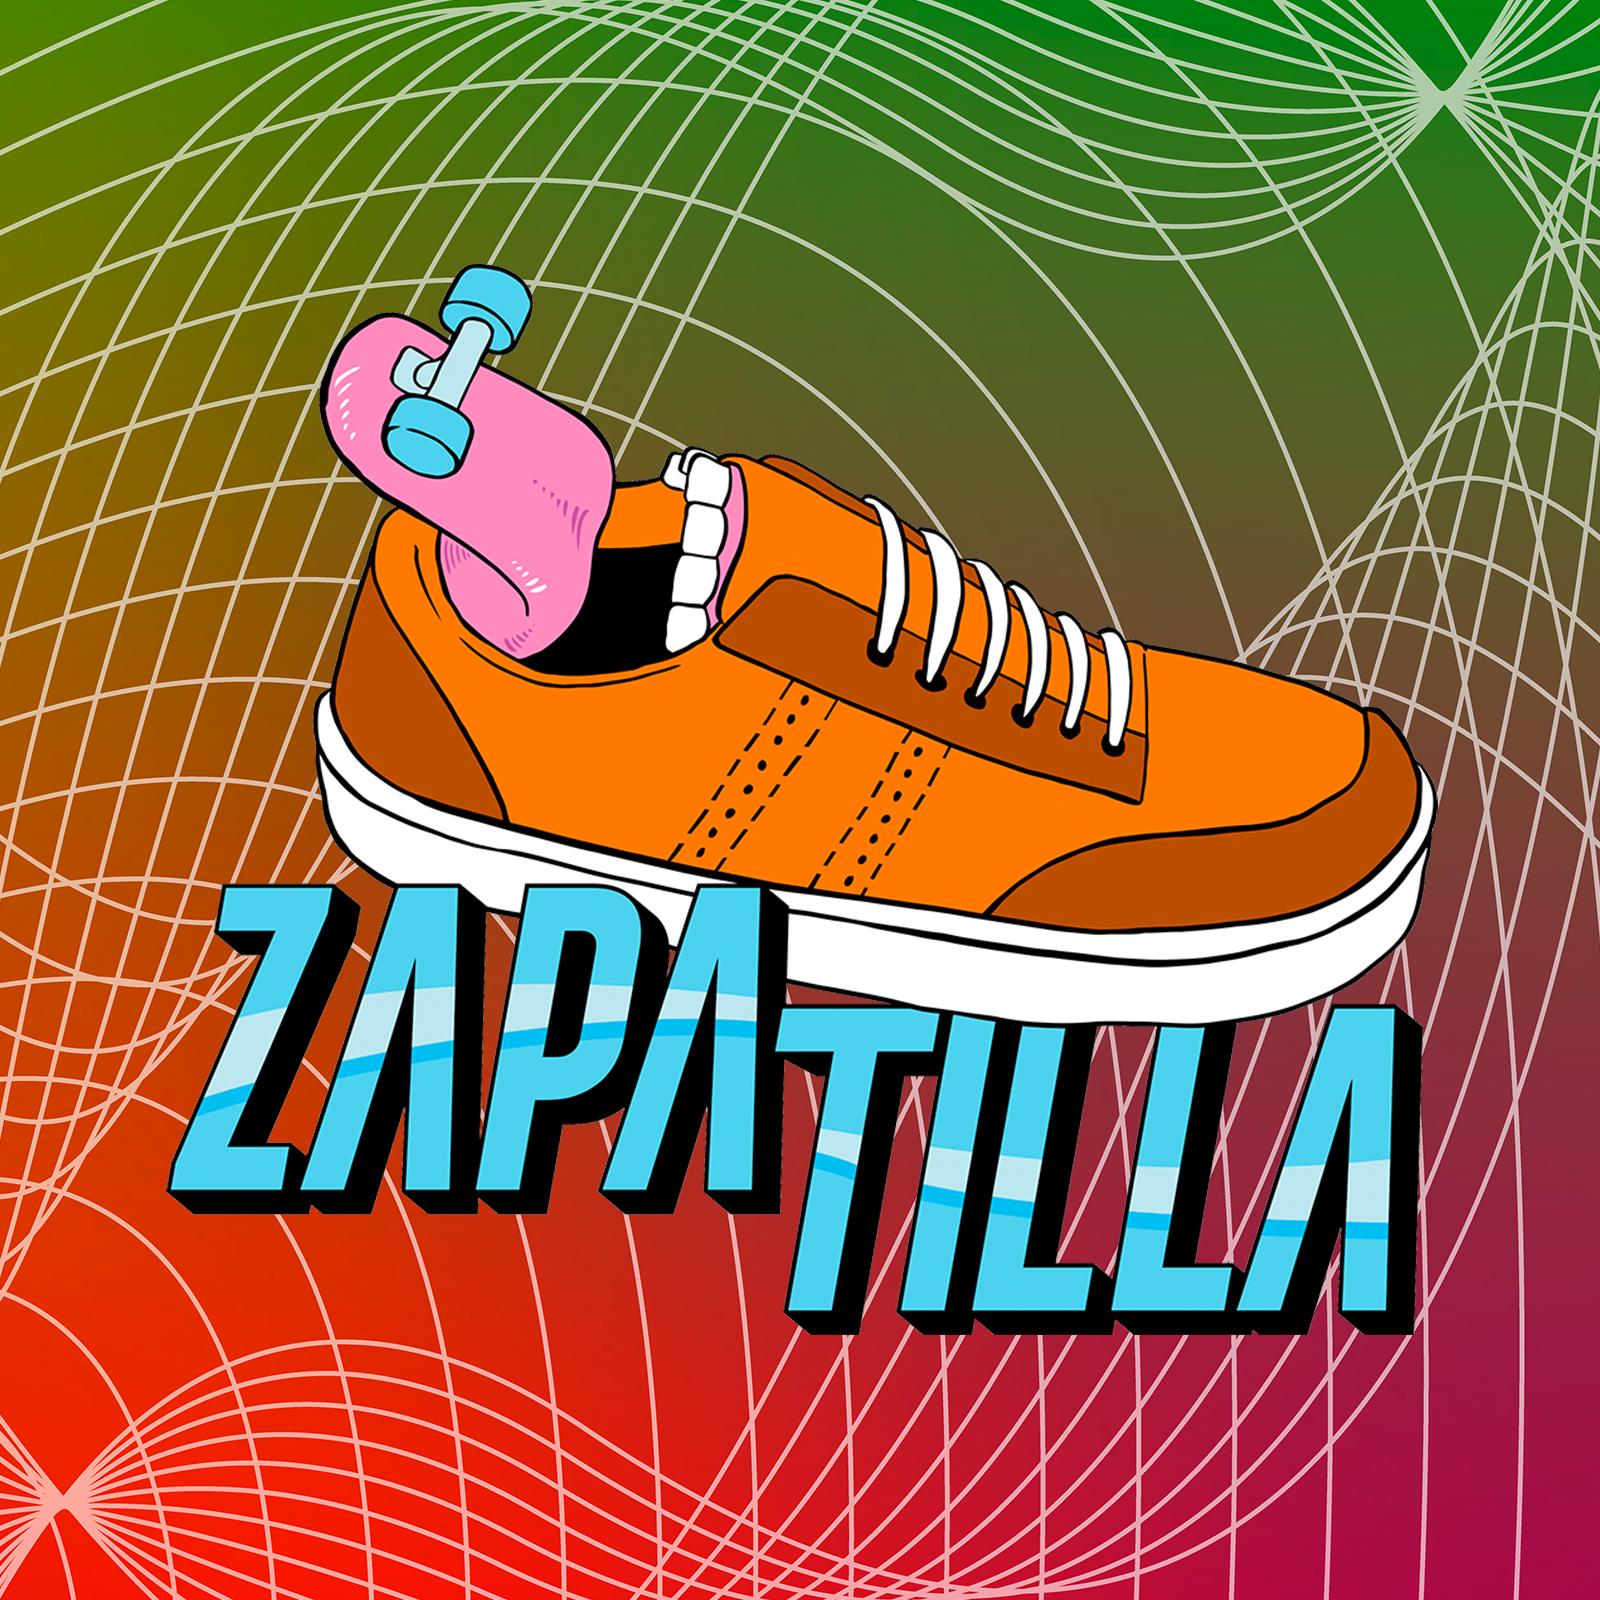 Zapatilla